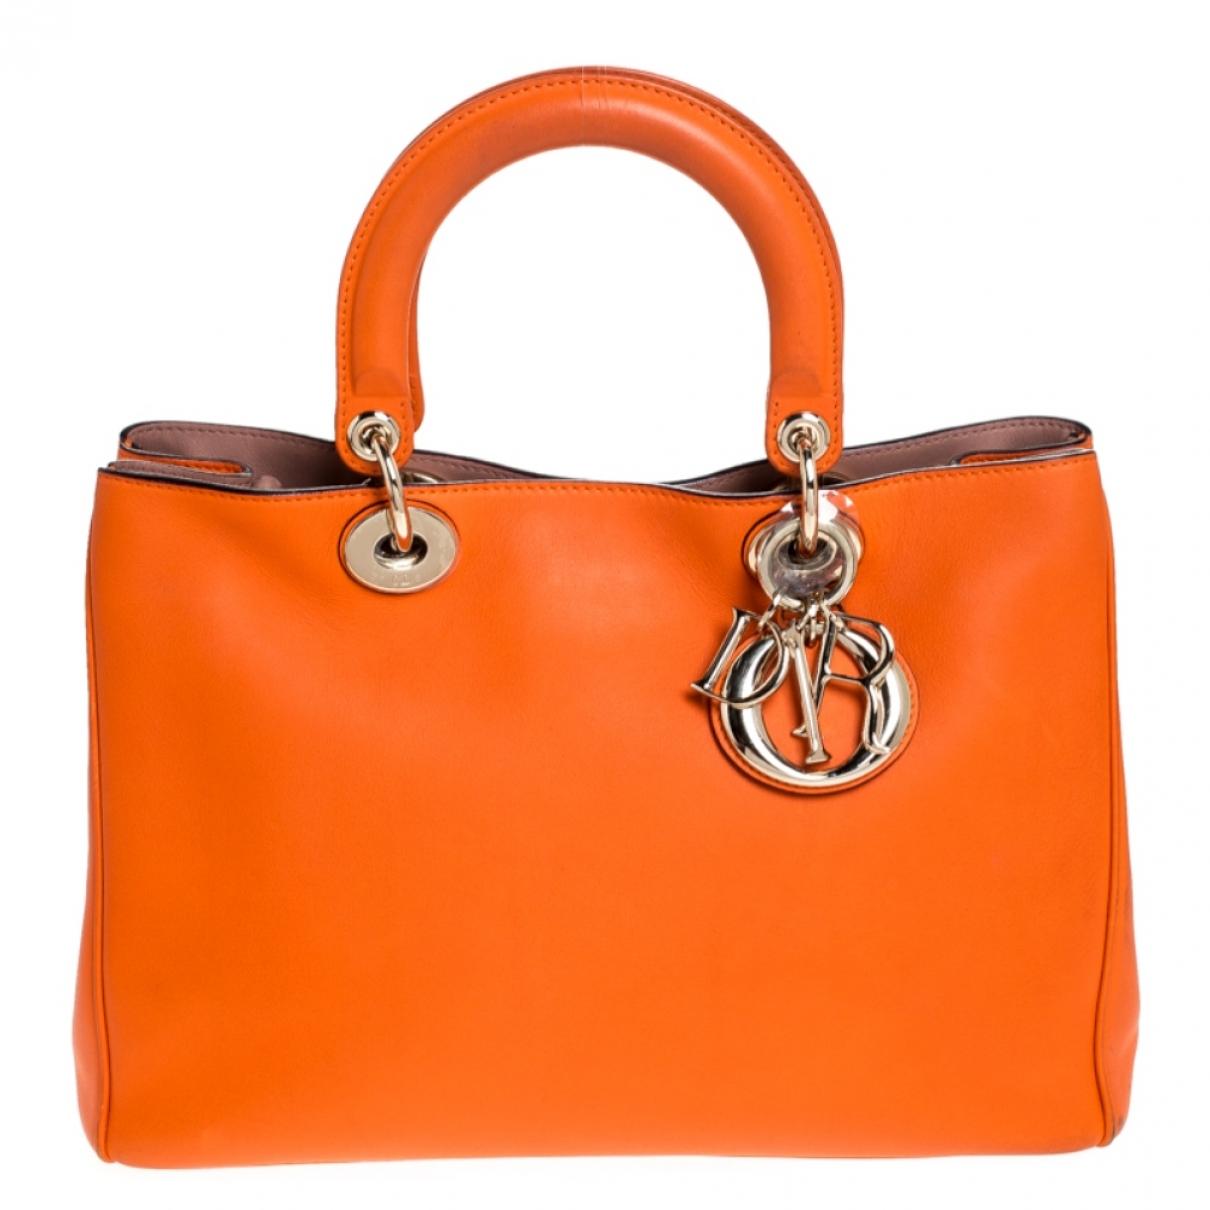 Dior Diorissimo Orange Leather handbag for Women \N